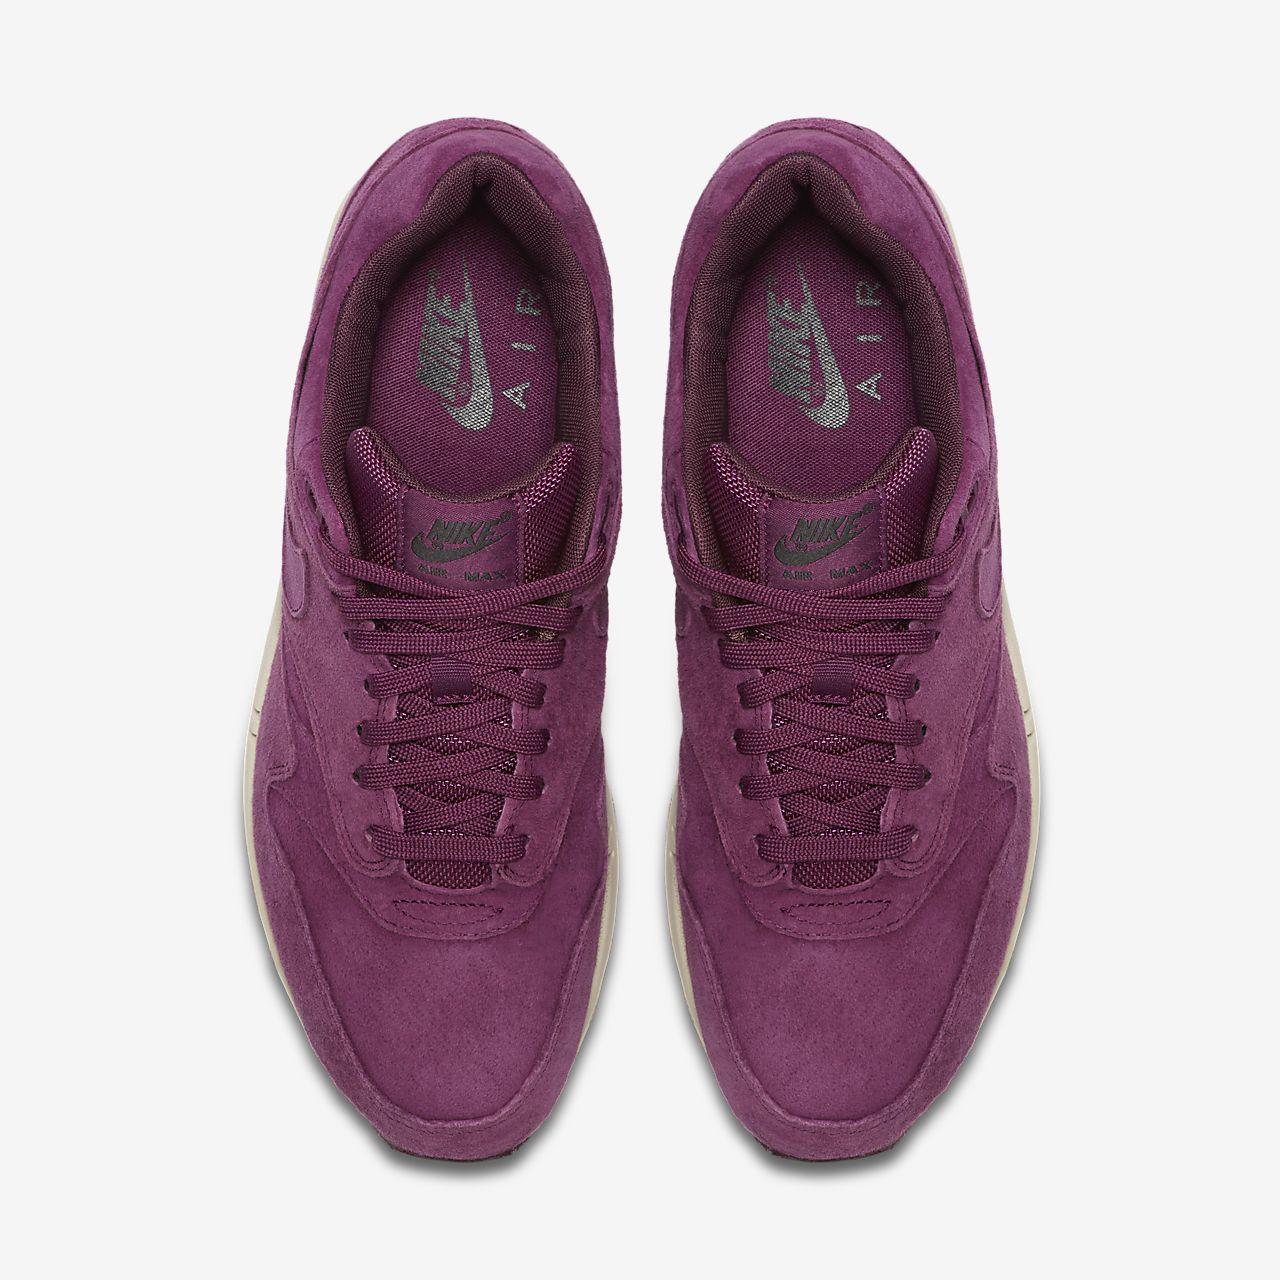 pretty nice 66cb3 626d0 ... Nike Air Max 1 Premium Men s Shoe